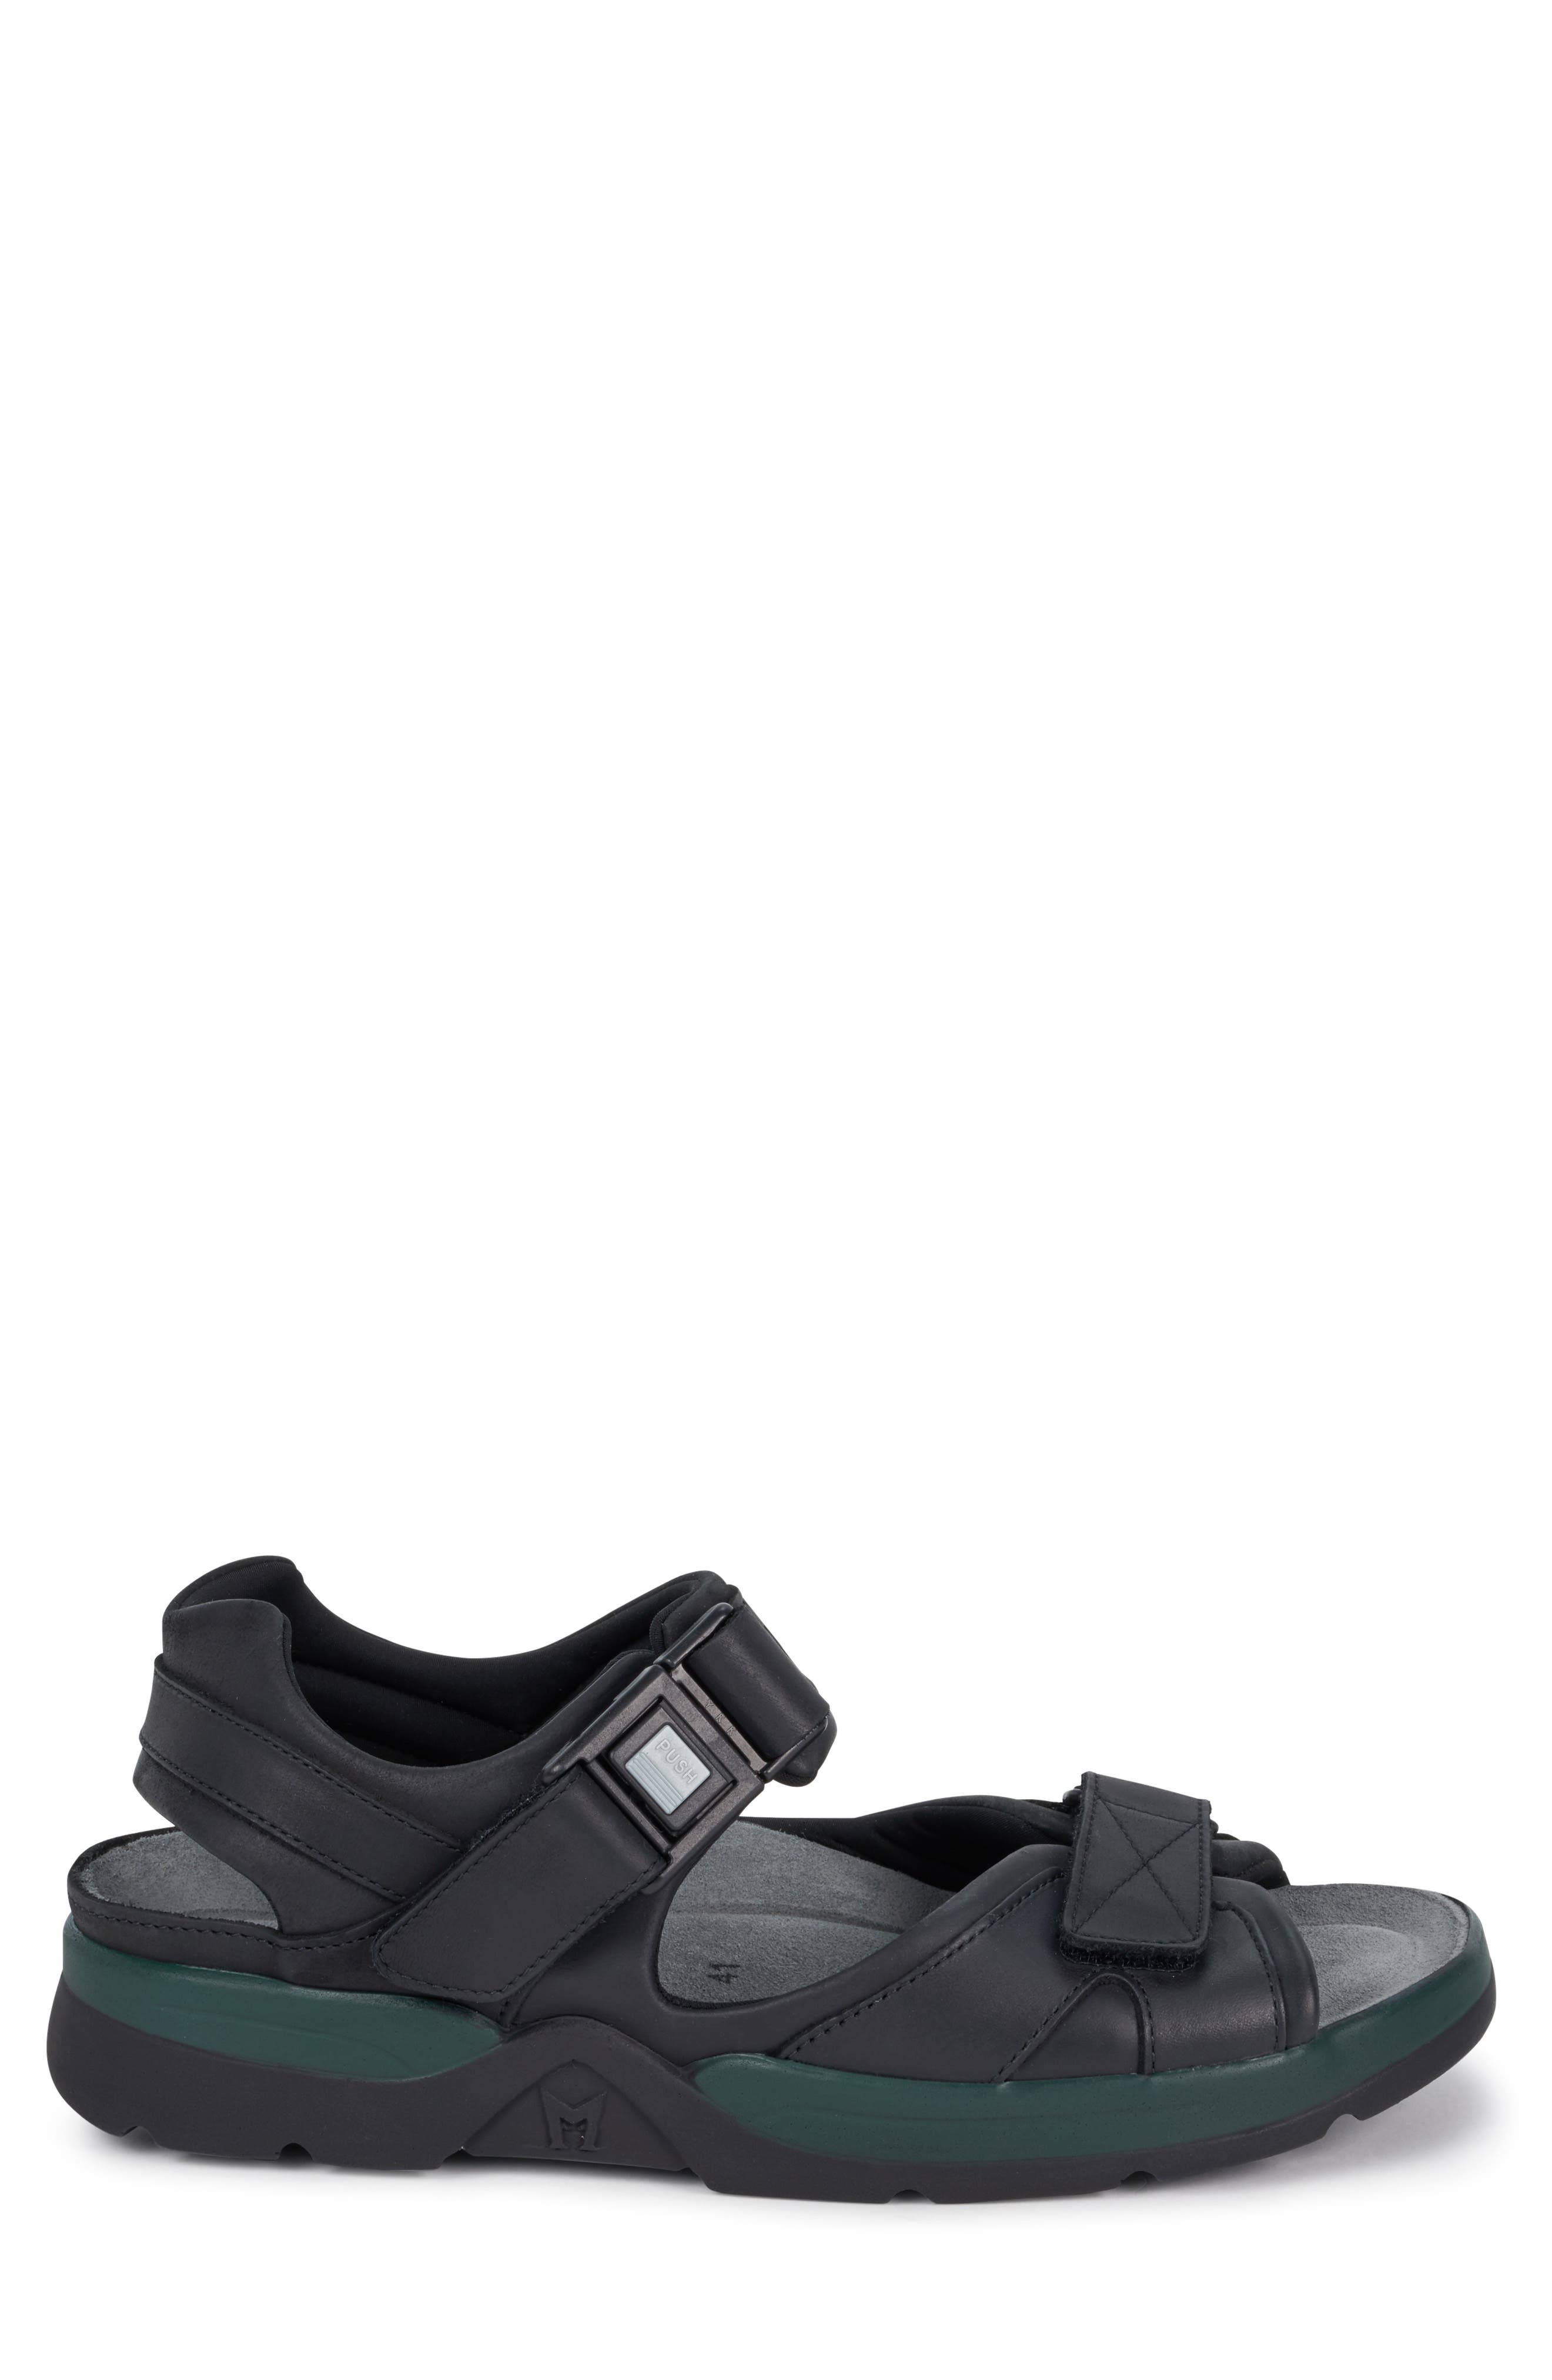 MEPHISTO, 'Shark' Sandal, Alternate thumbnail 3, color, BLACK WAXED LEATHER